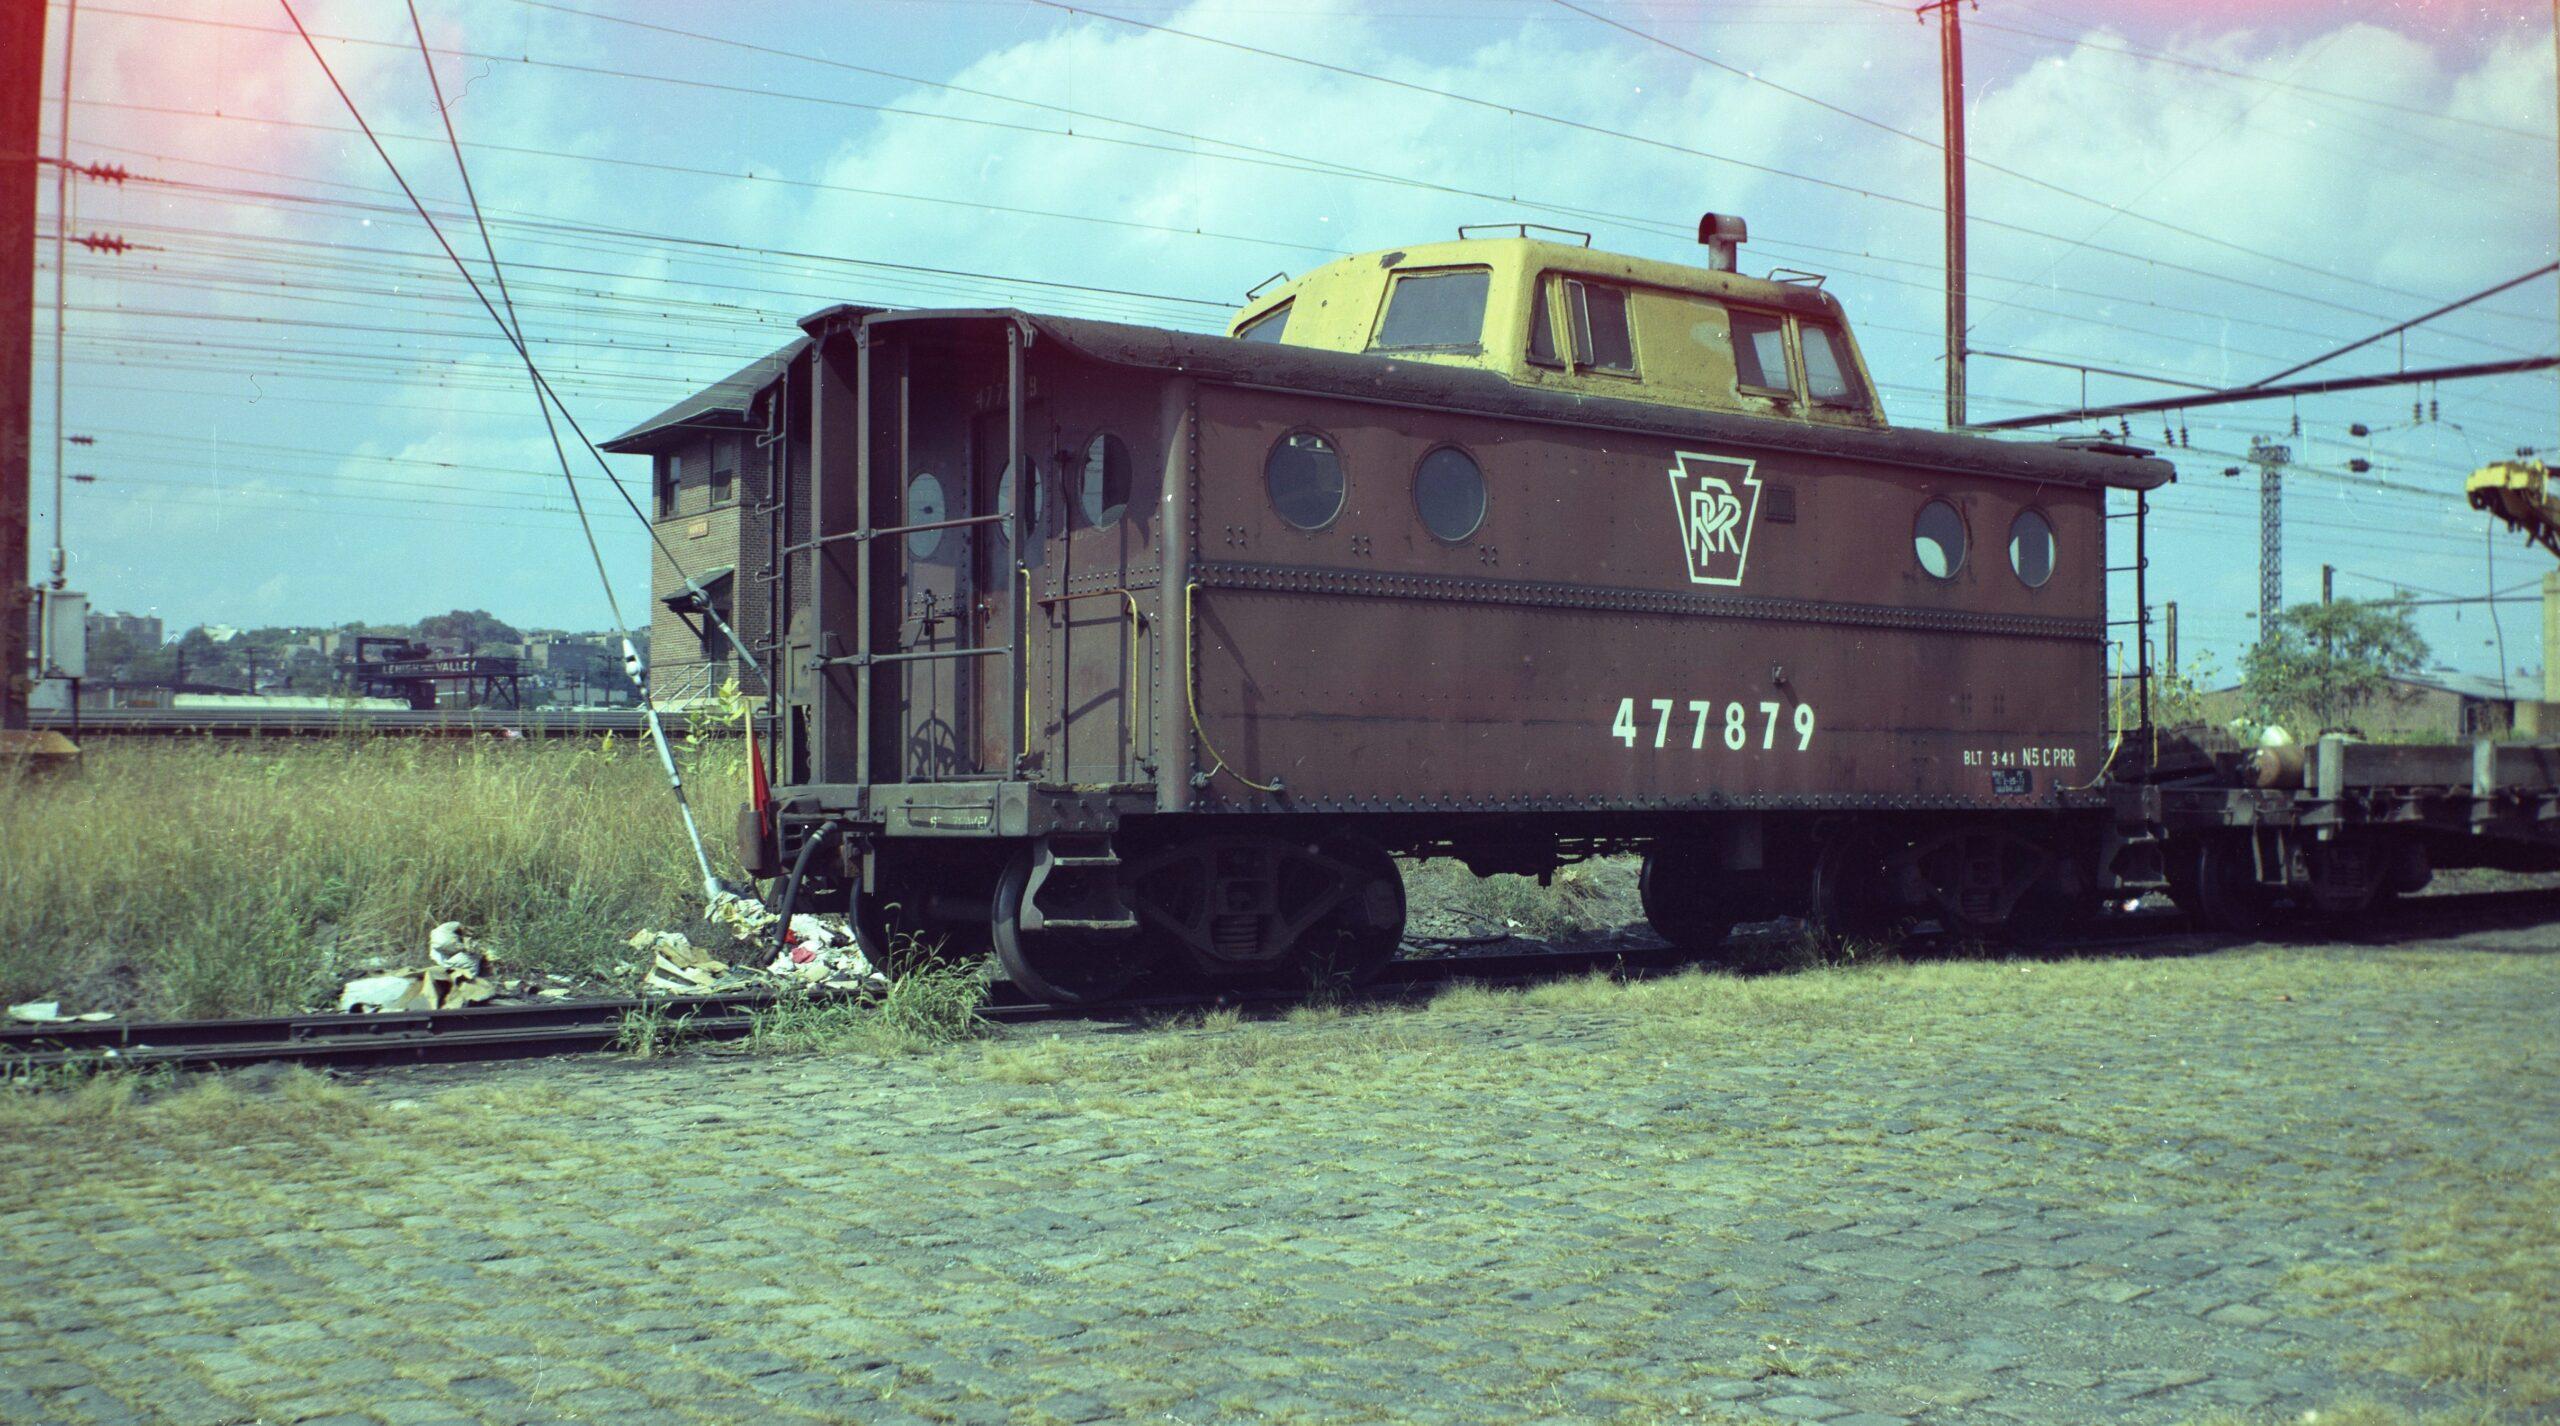 Pennsylvania Railroad | Newark, New Jersey | N-5C Class caboose 477879 | September 23, 1973